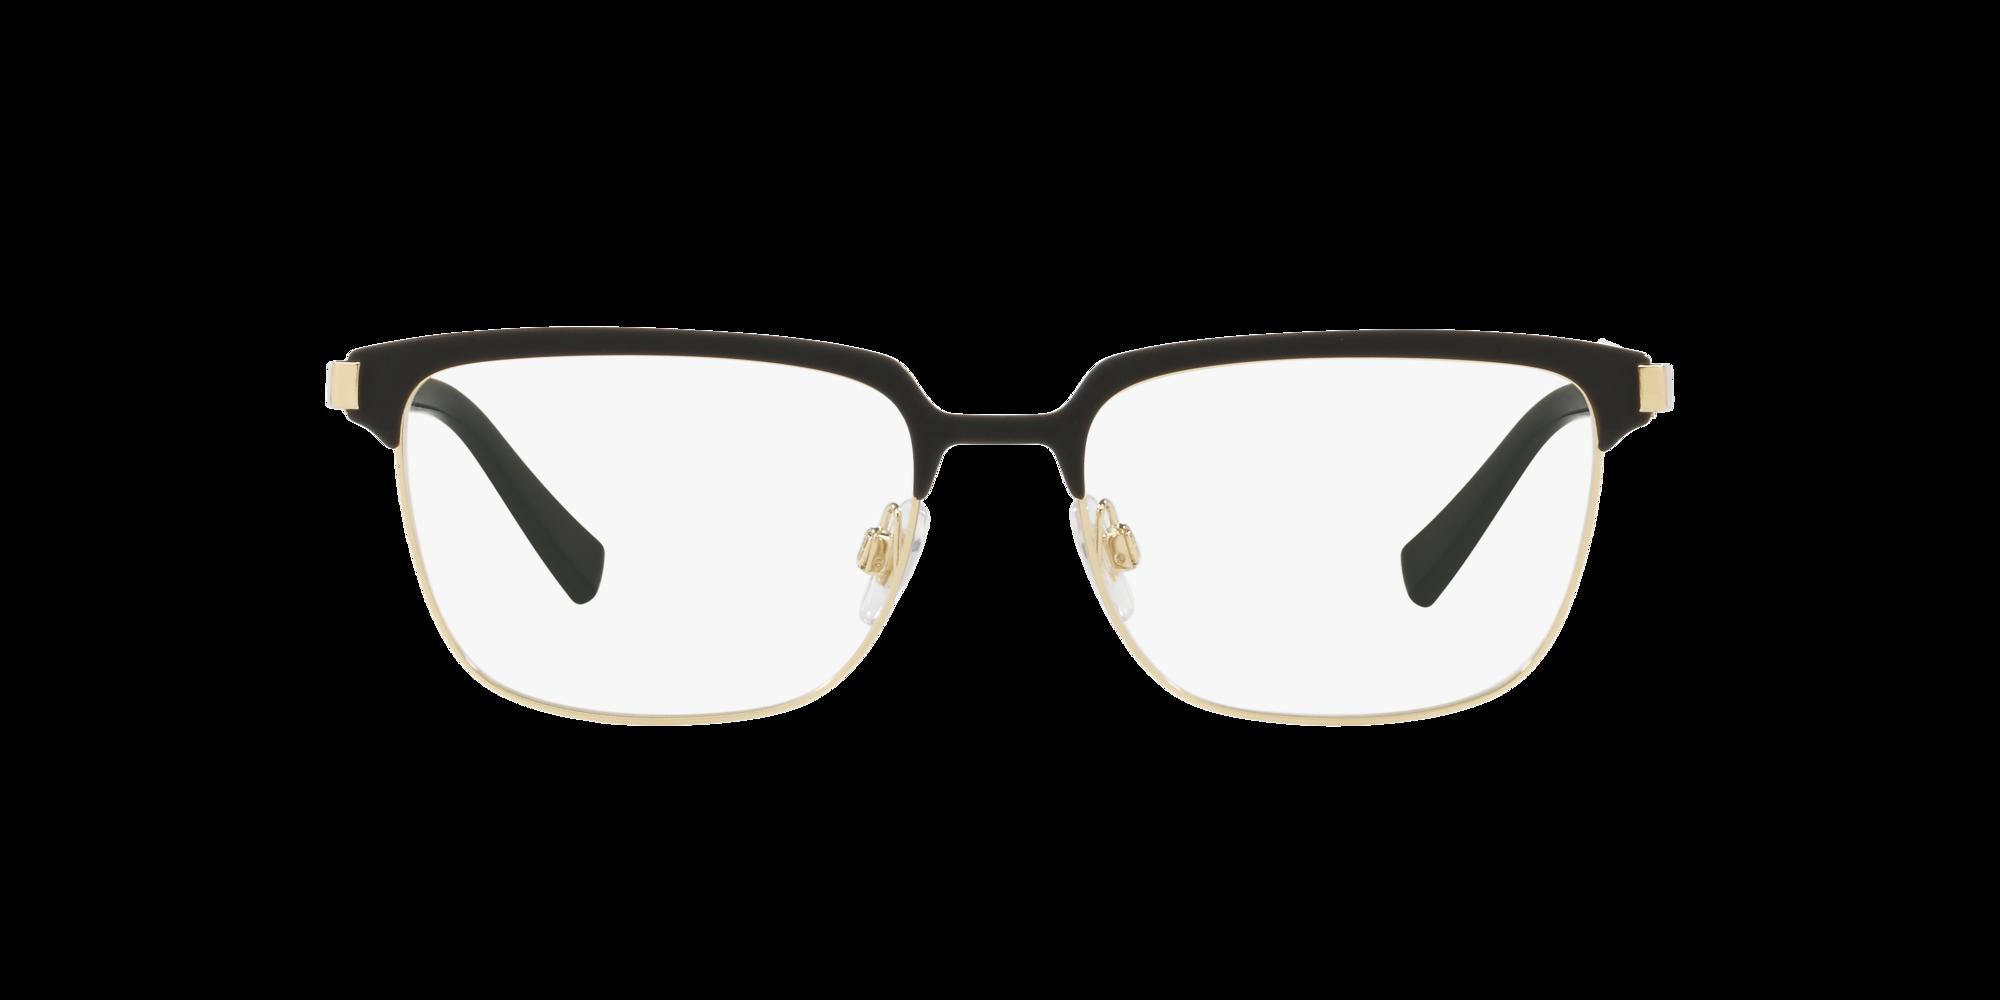 Image for DG1302 from LensCrafters | Glasses, Prescription Glasses Online, Eyewear